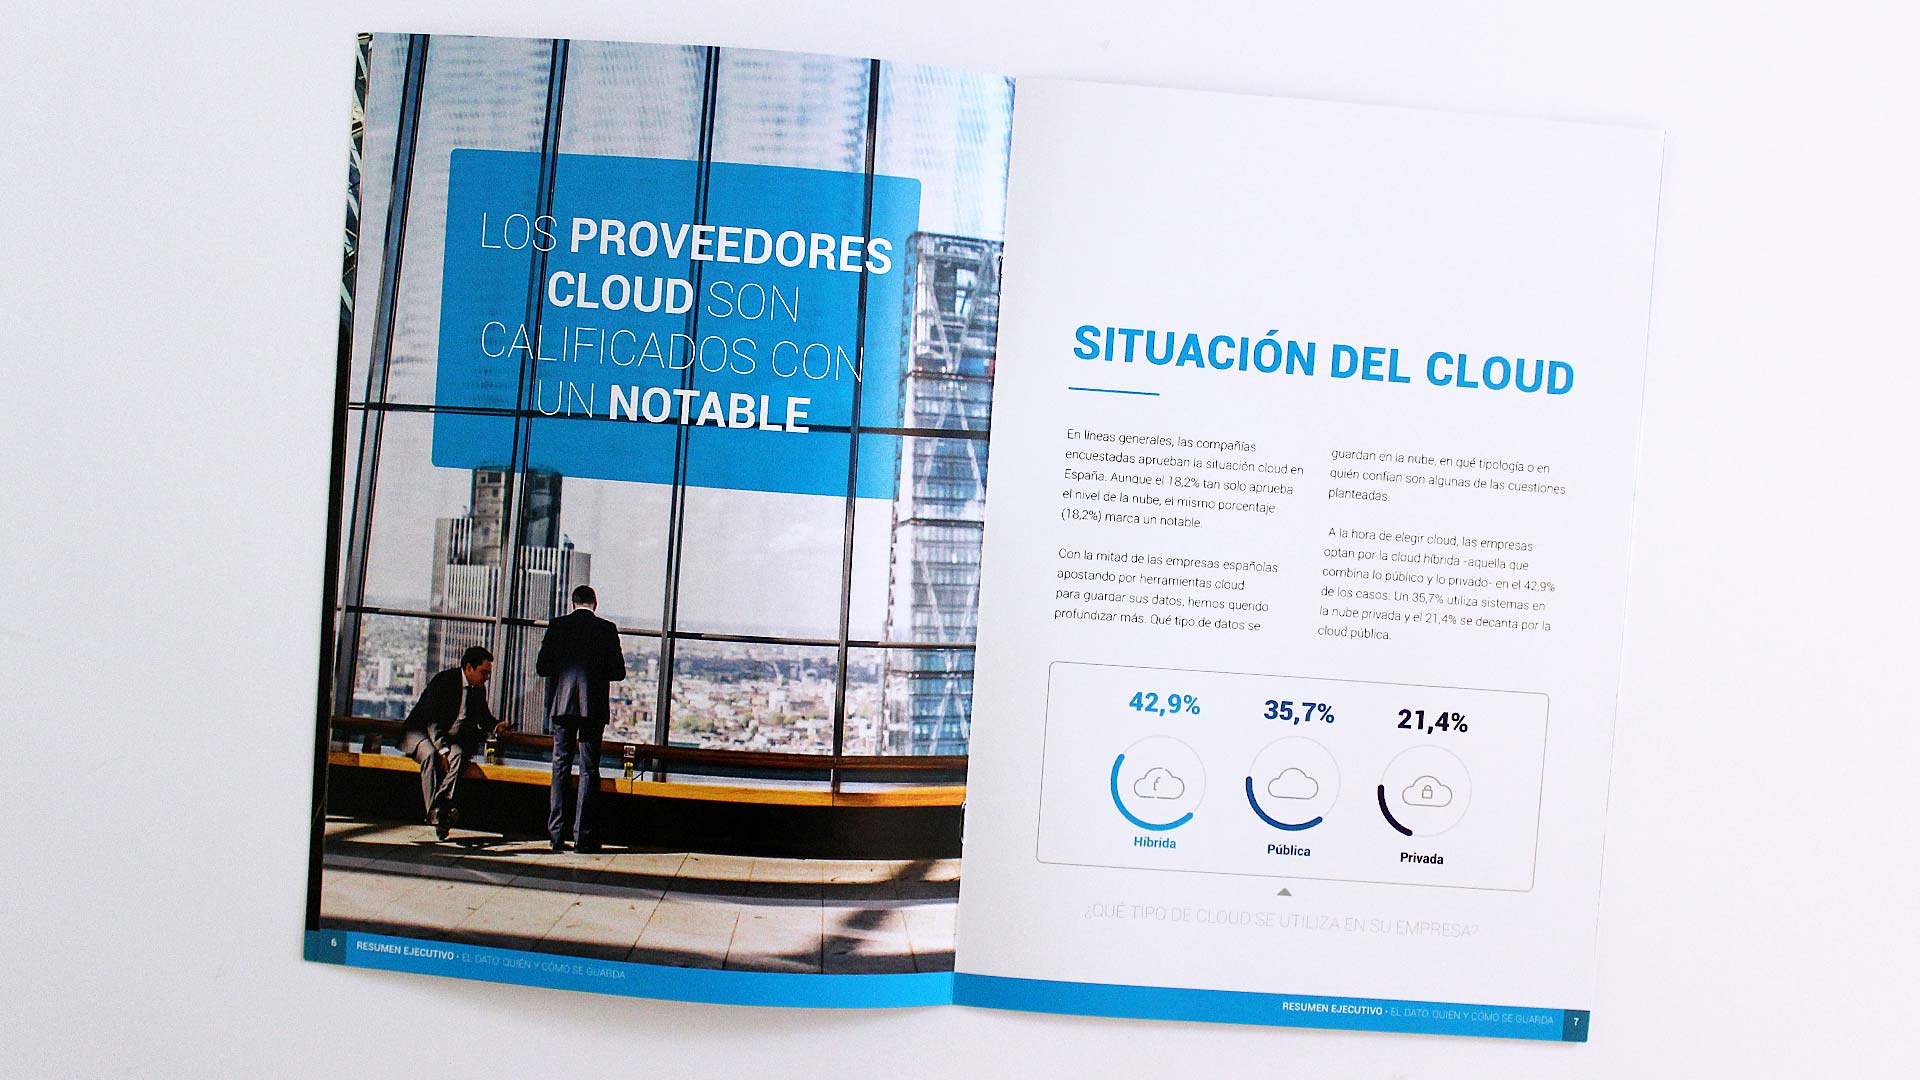 netapp-mediacloud-content-marketing-informe-resumen-ejecutivo-ebook-2017-05